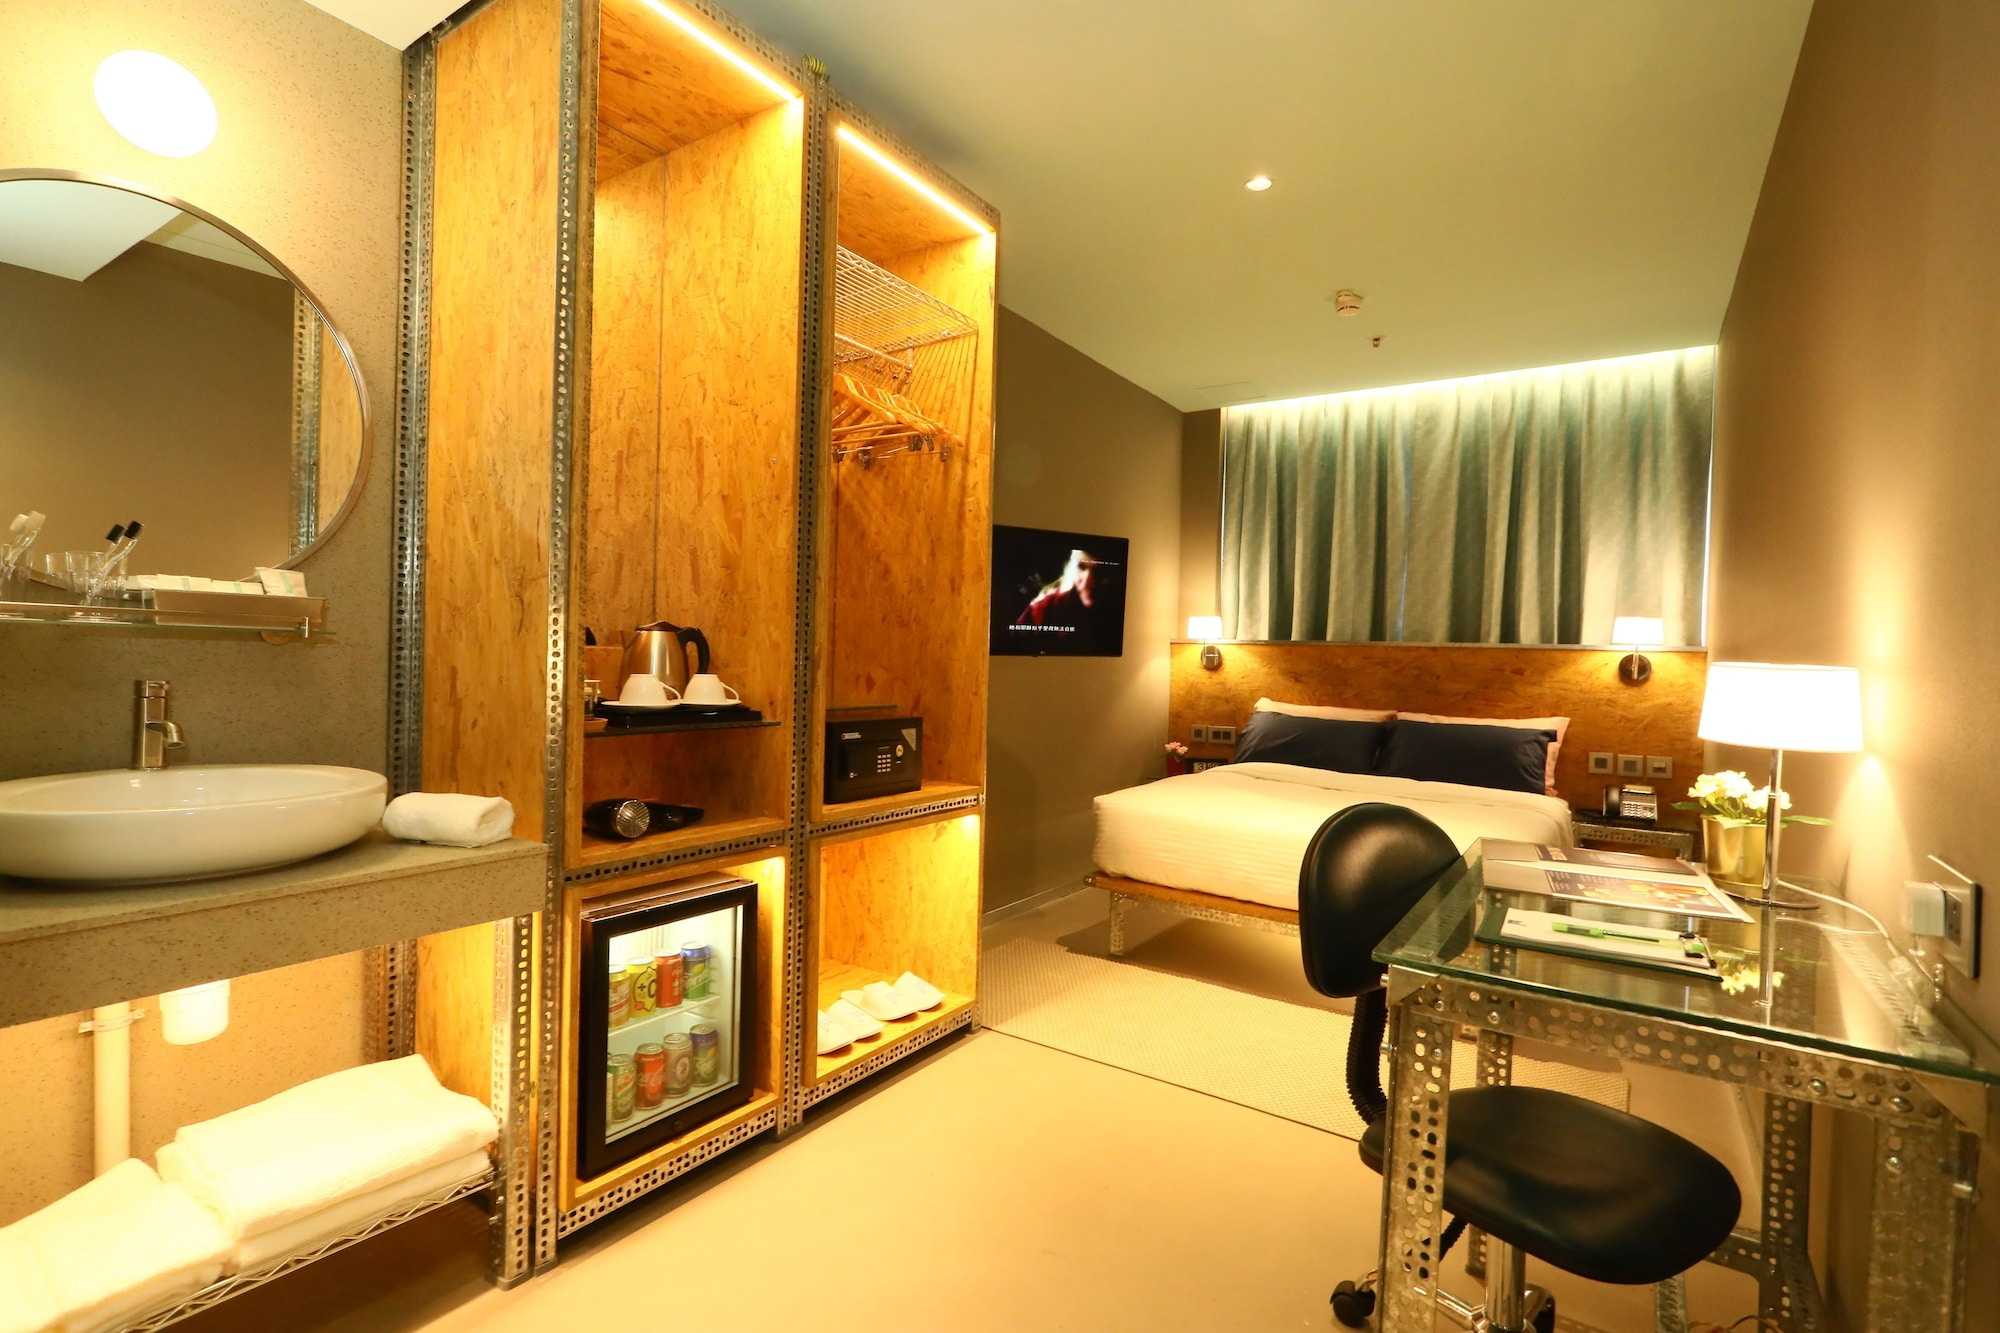 IND Hotel, Kwun Tong